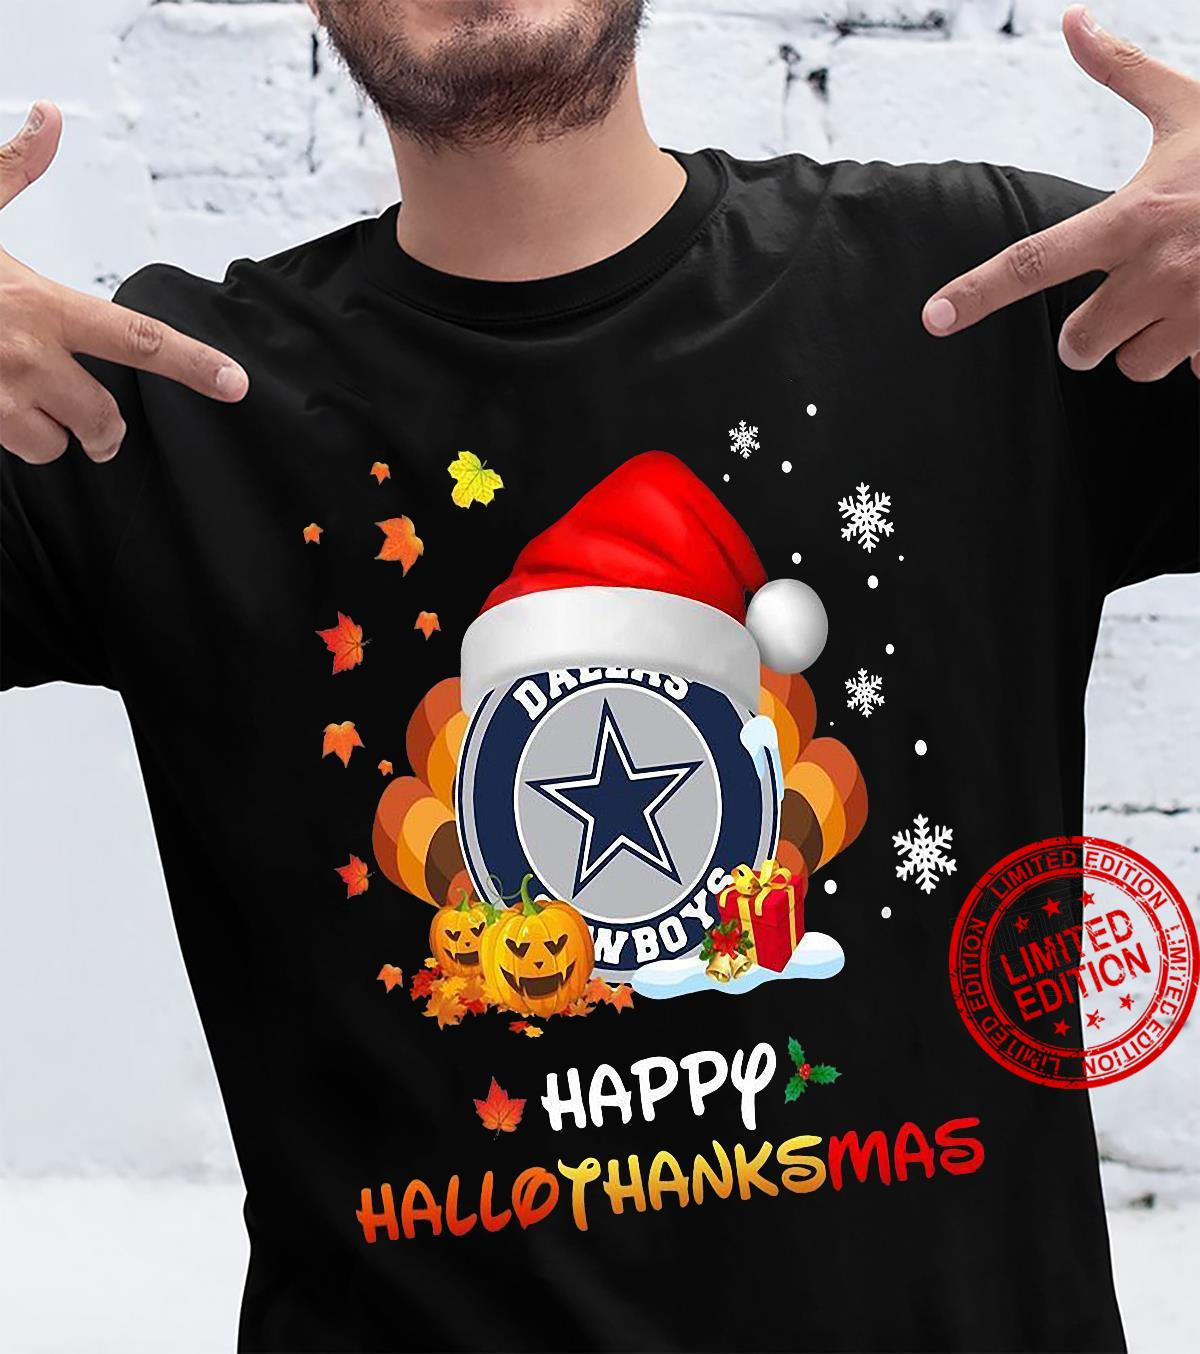 Happy Hallo Thanks Mas Shirt